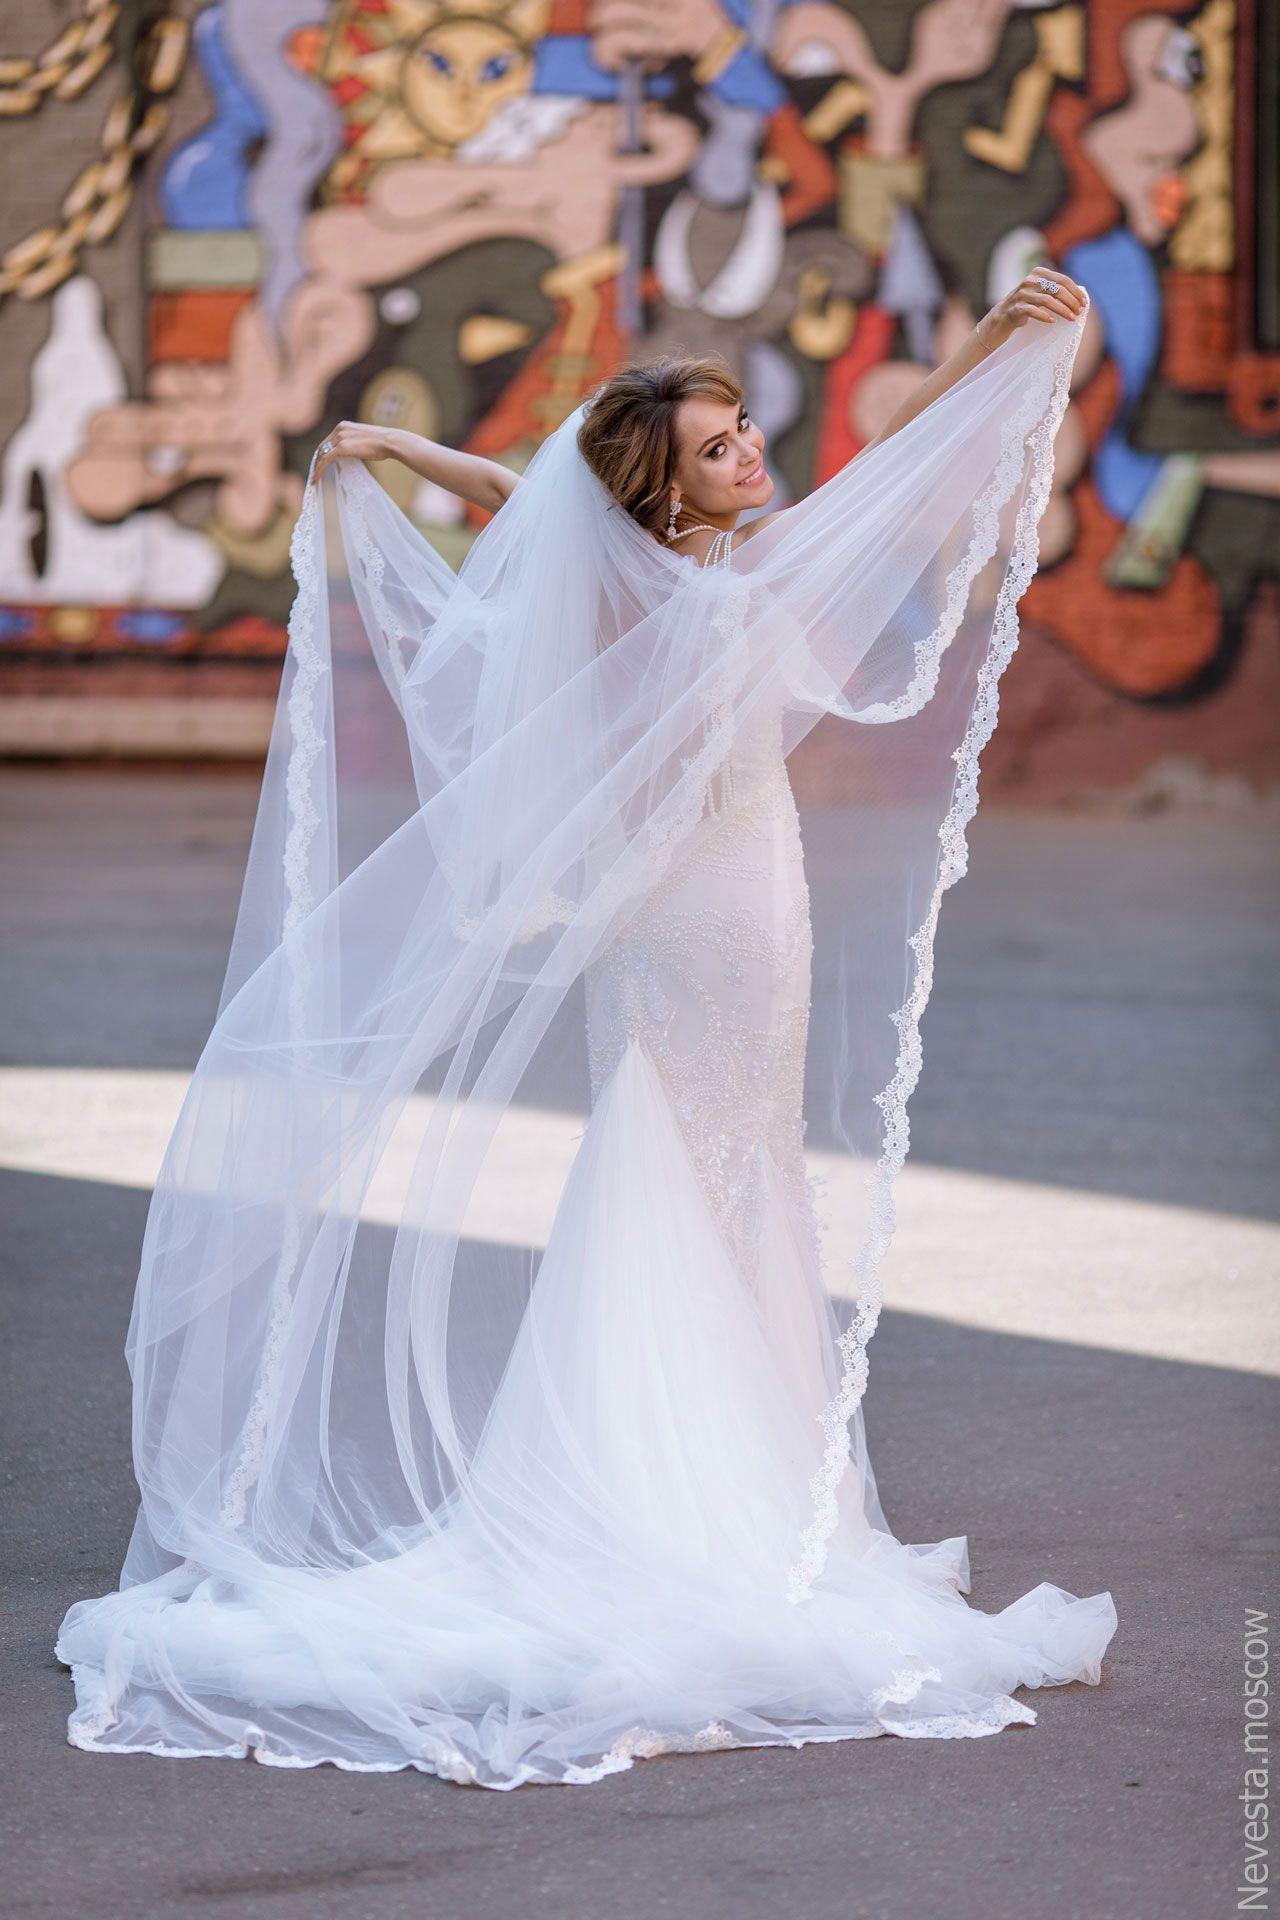 Актриса Анна Калашникова в образе белого лебедя фото 41